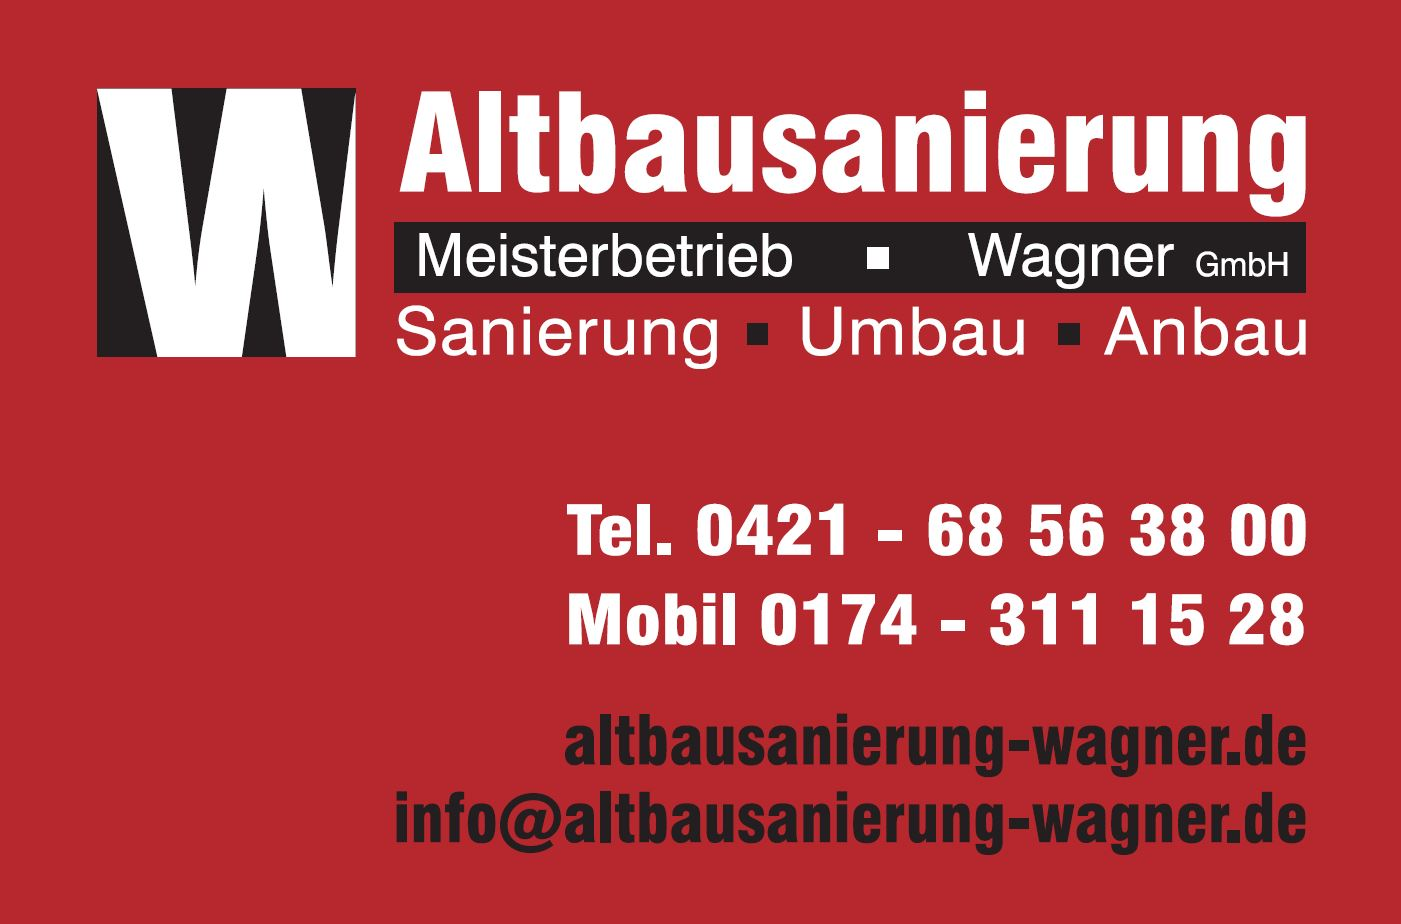 Altbausanierung-Wagner